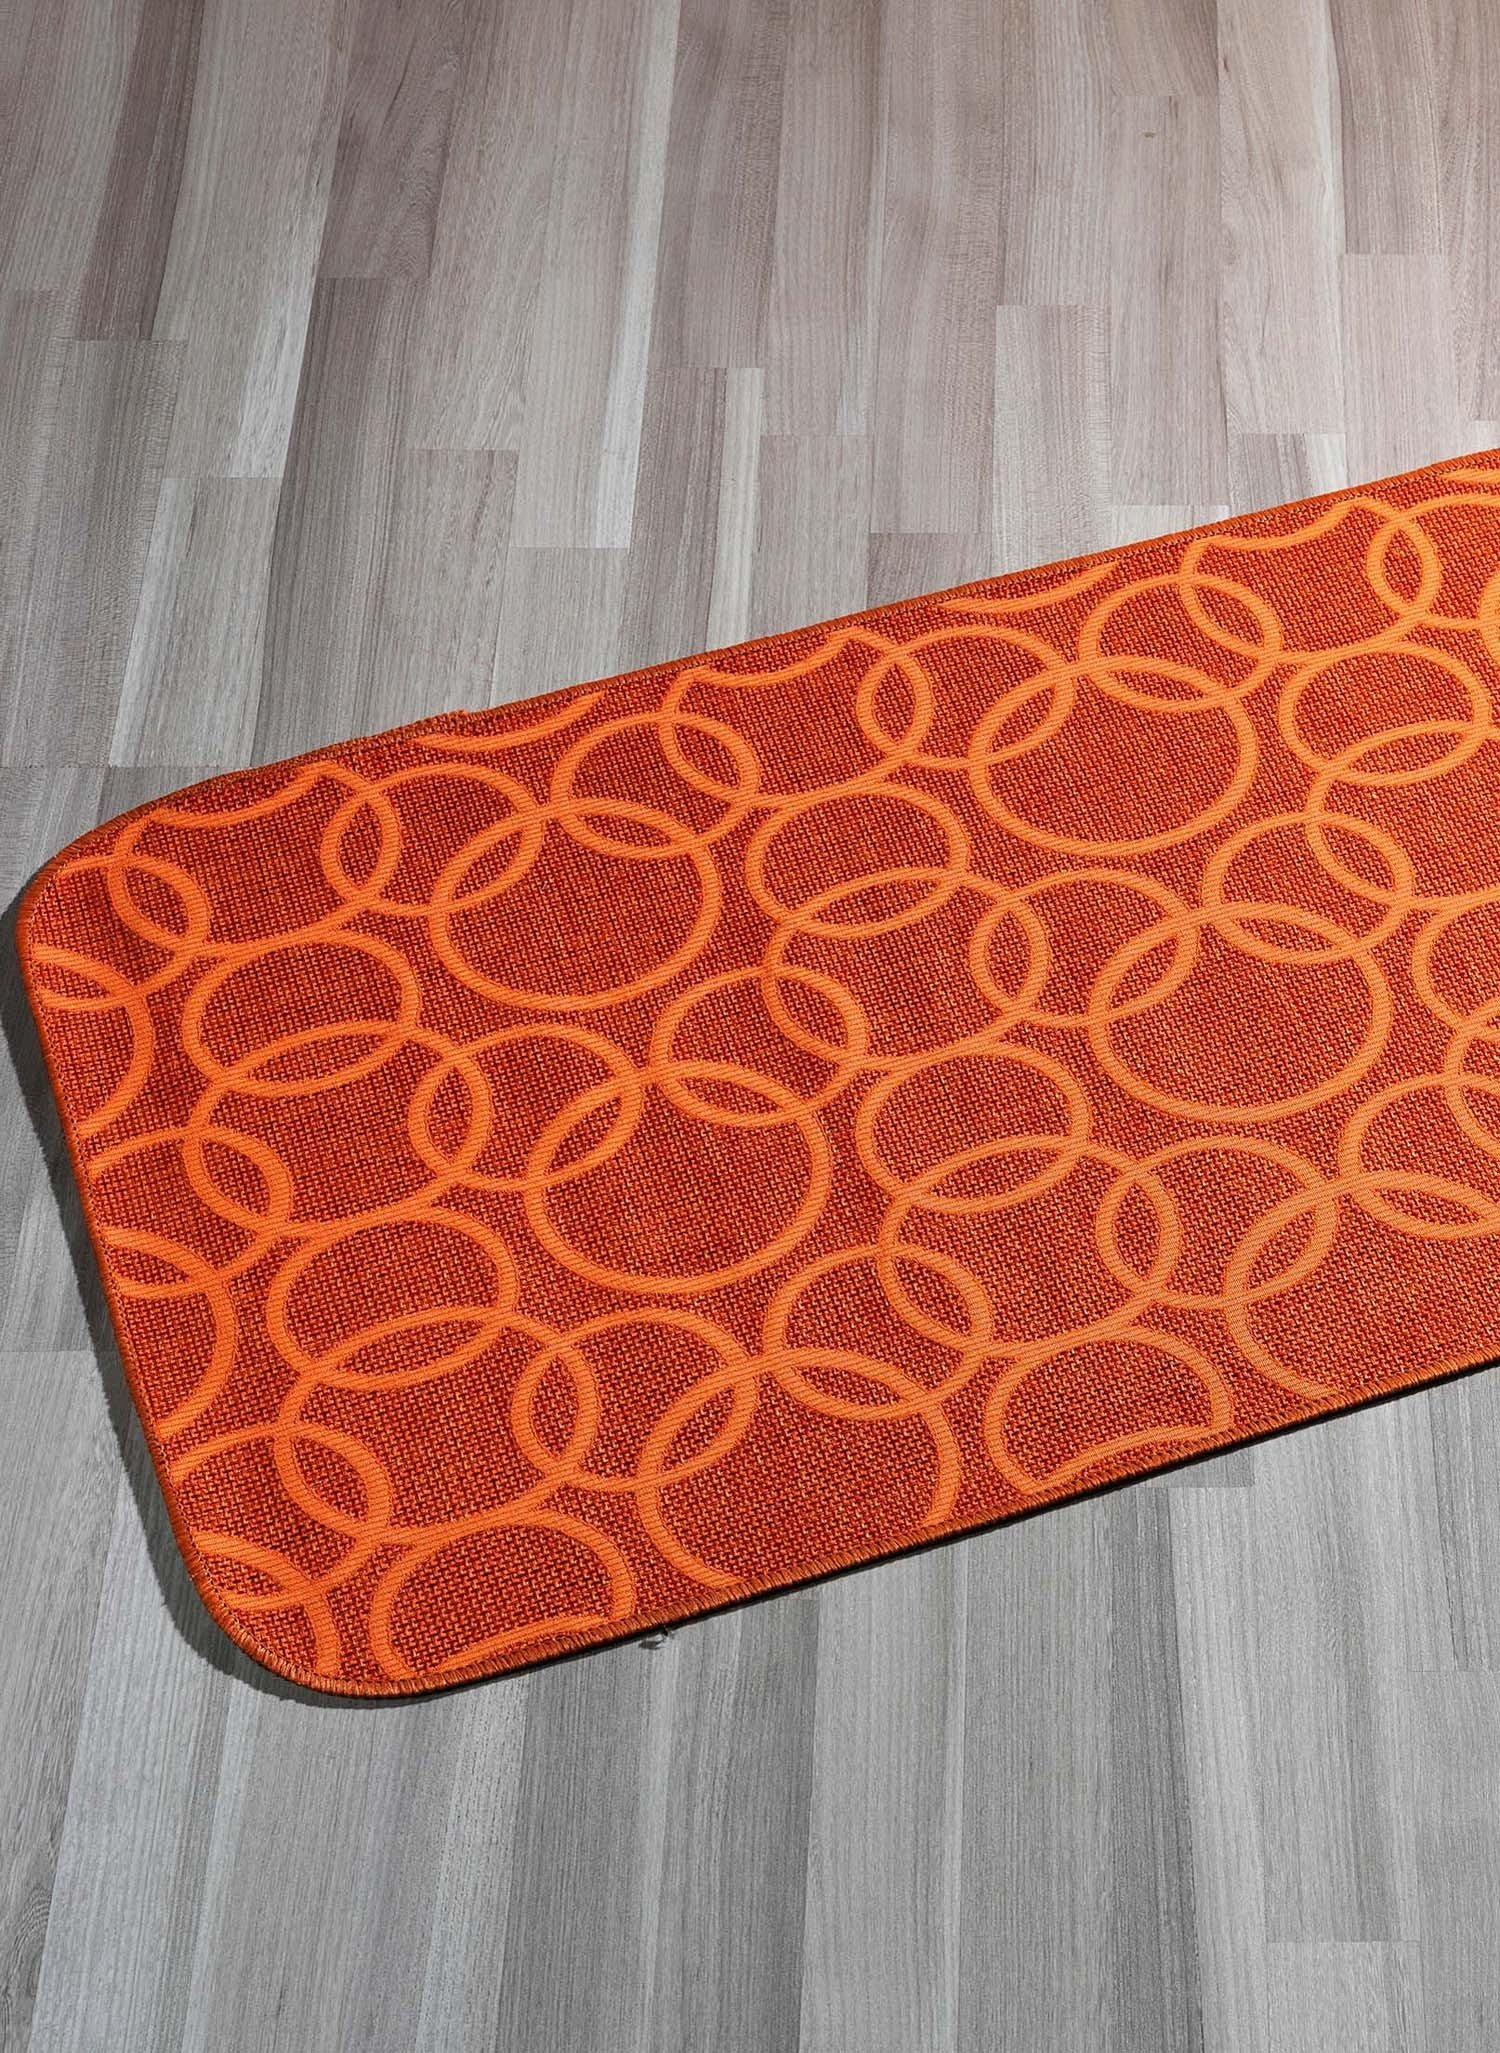 "Teppich""RINGE""orange 57x115 - 1 - Ronja.ch"